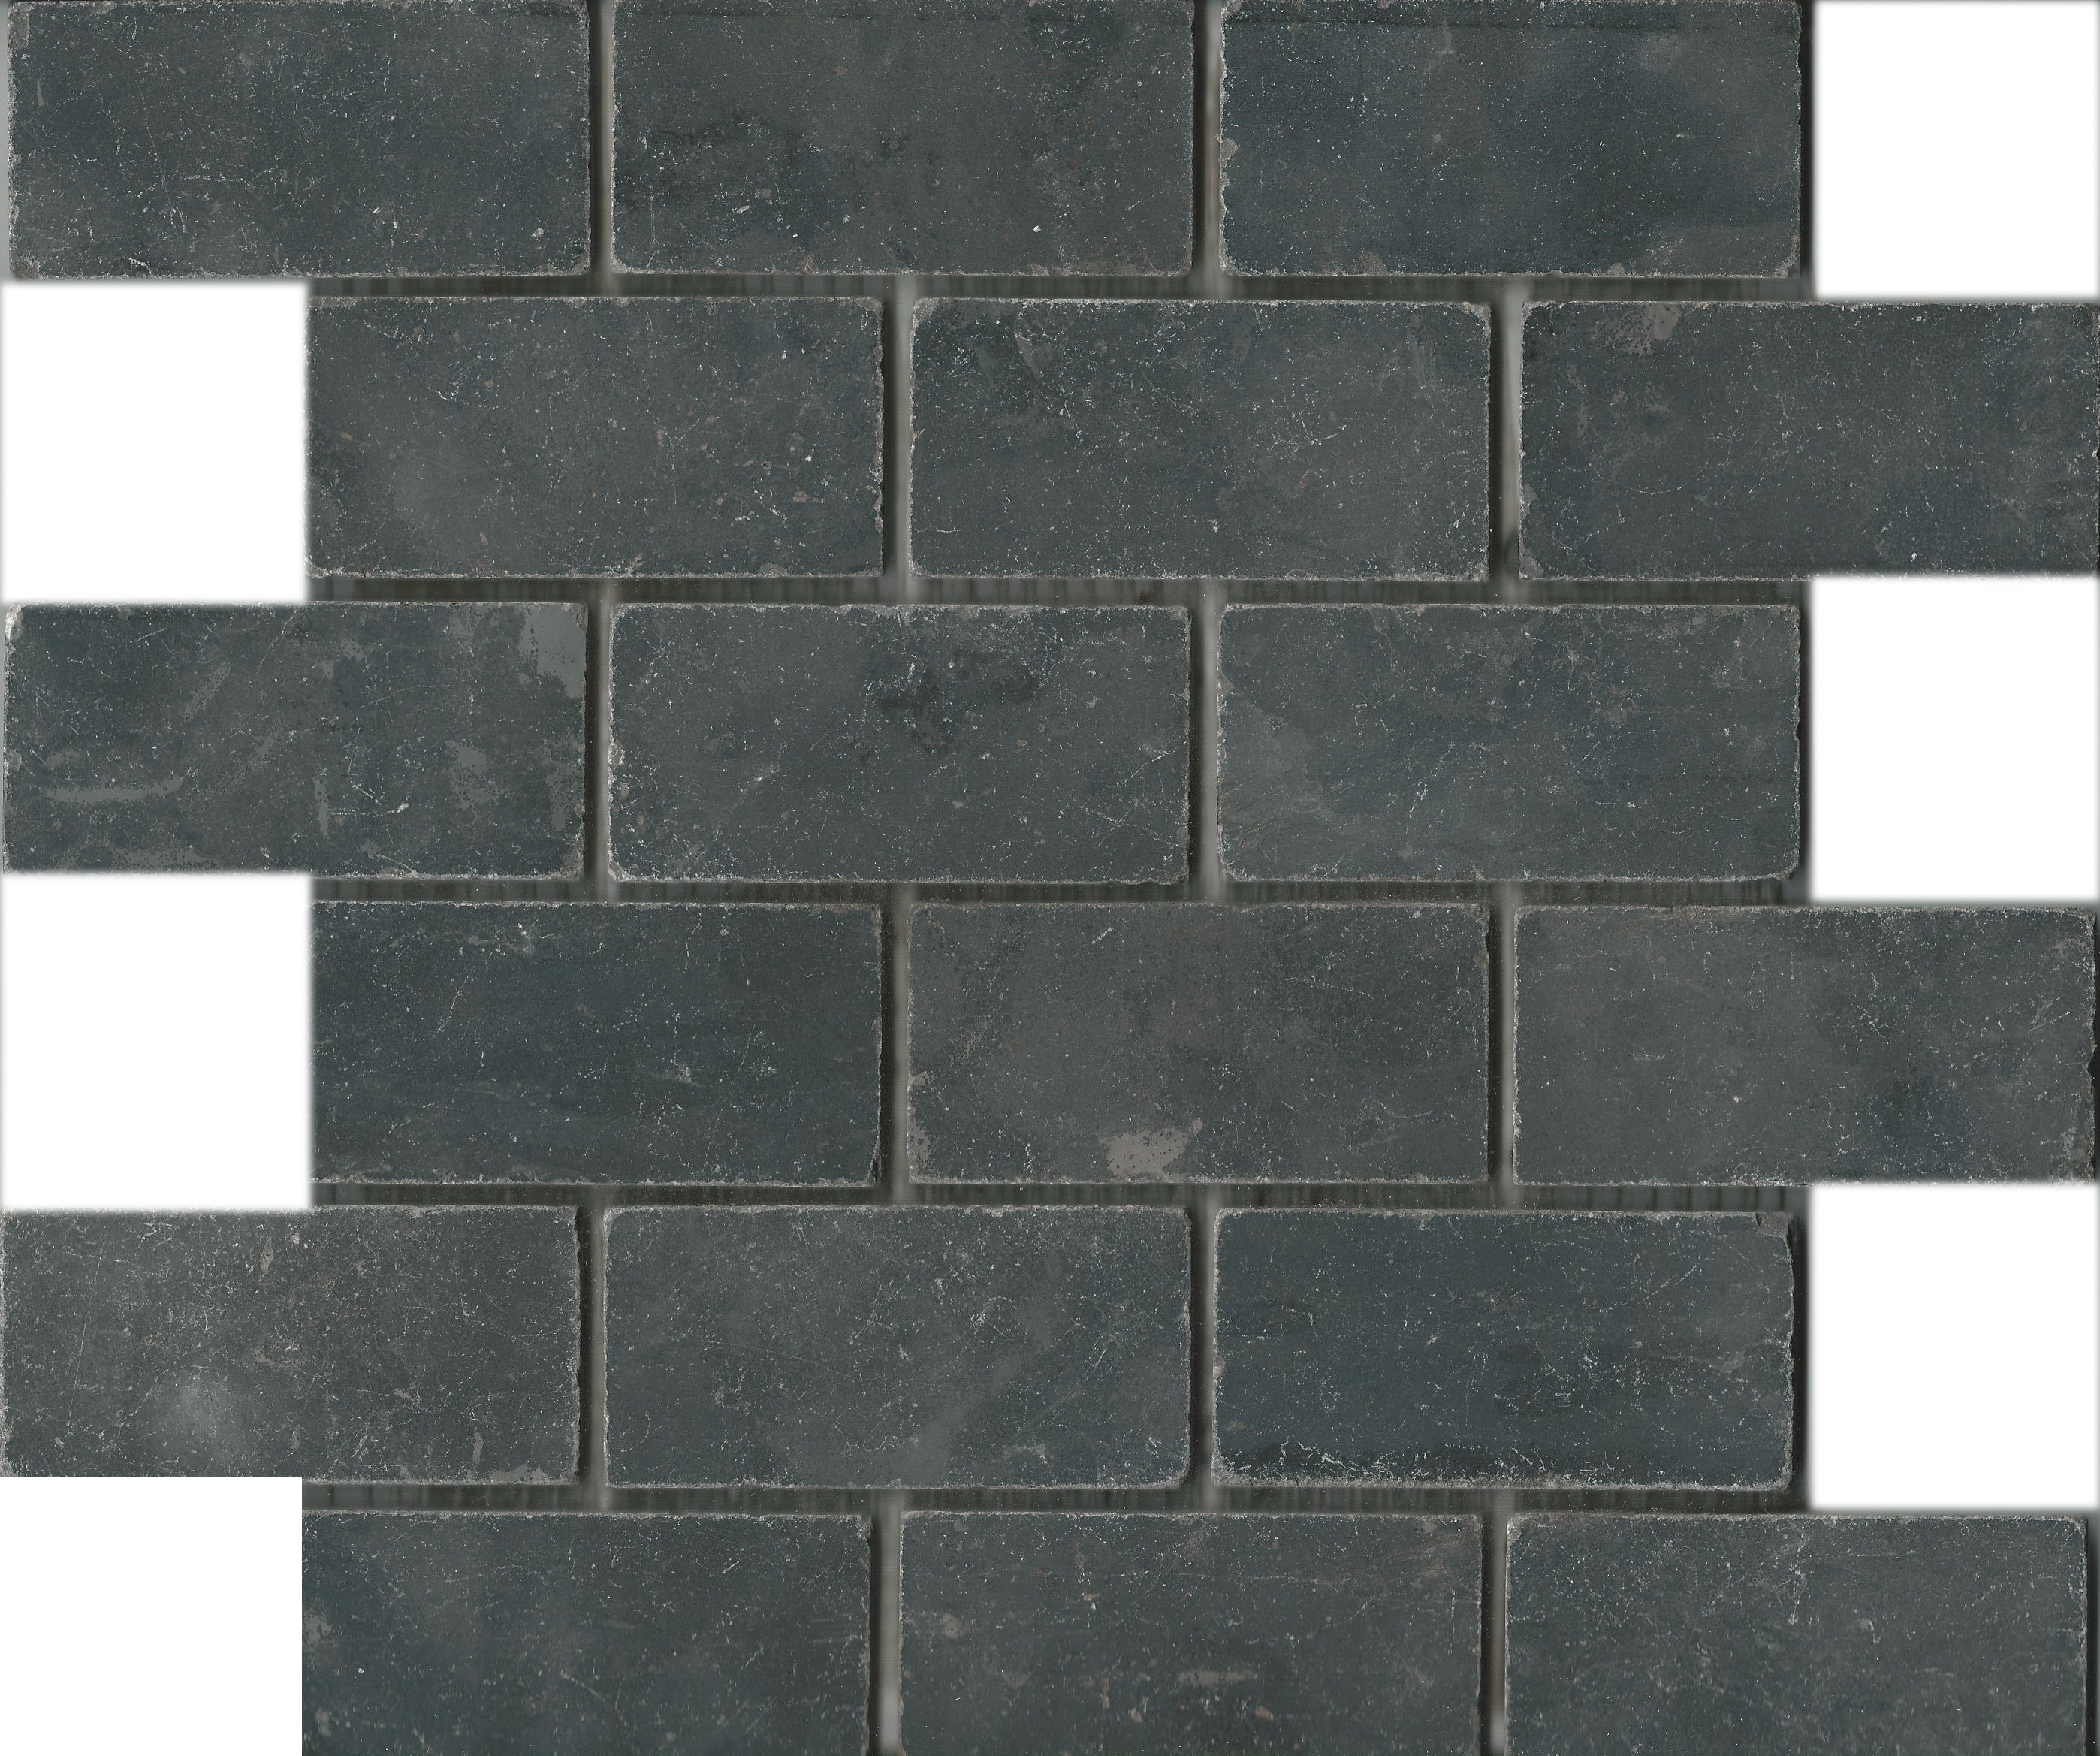 Natuursteen limestone dark mozaiek 5x10x1 € 7.00 bij Max4home